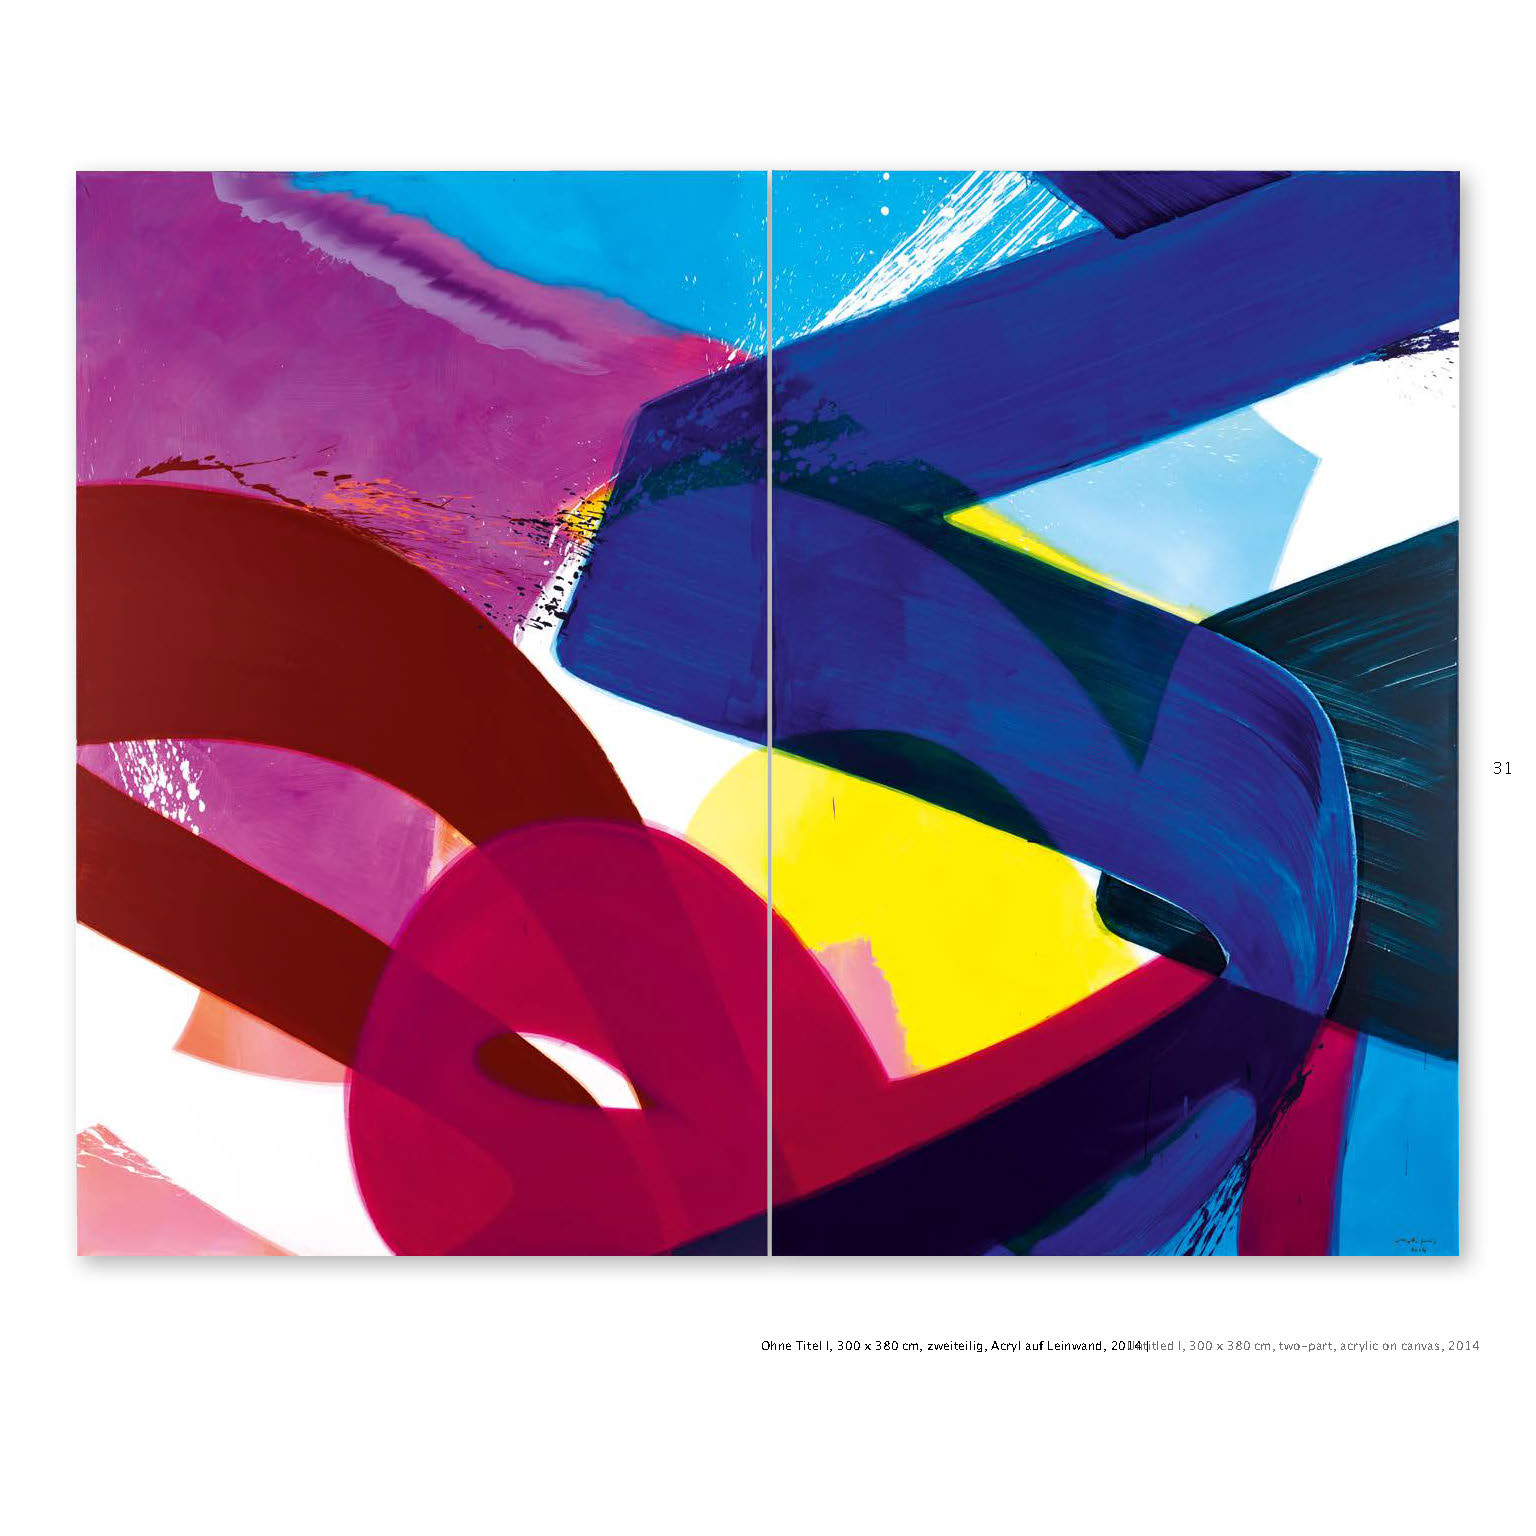 Ausstellungskatalog Aatifi Malerei Acryl auf Leinwand 2014